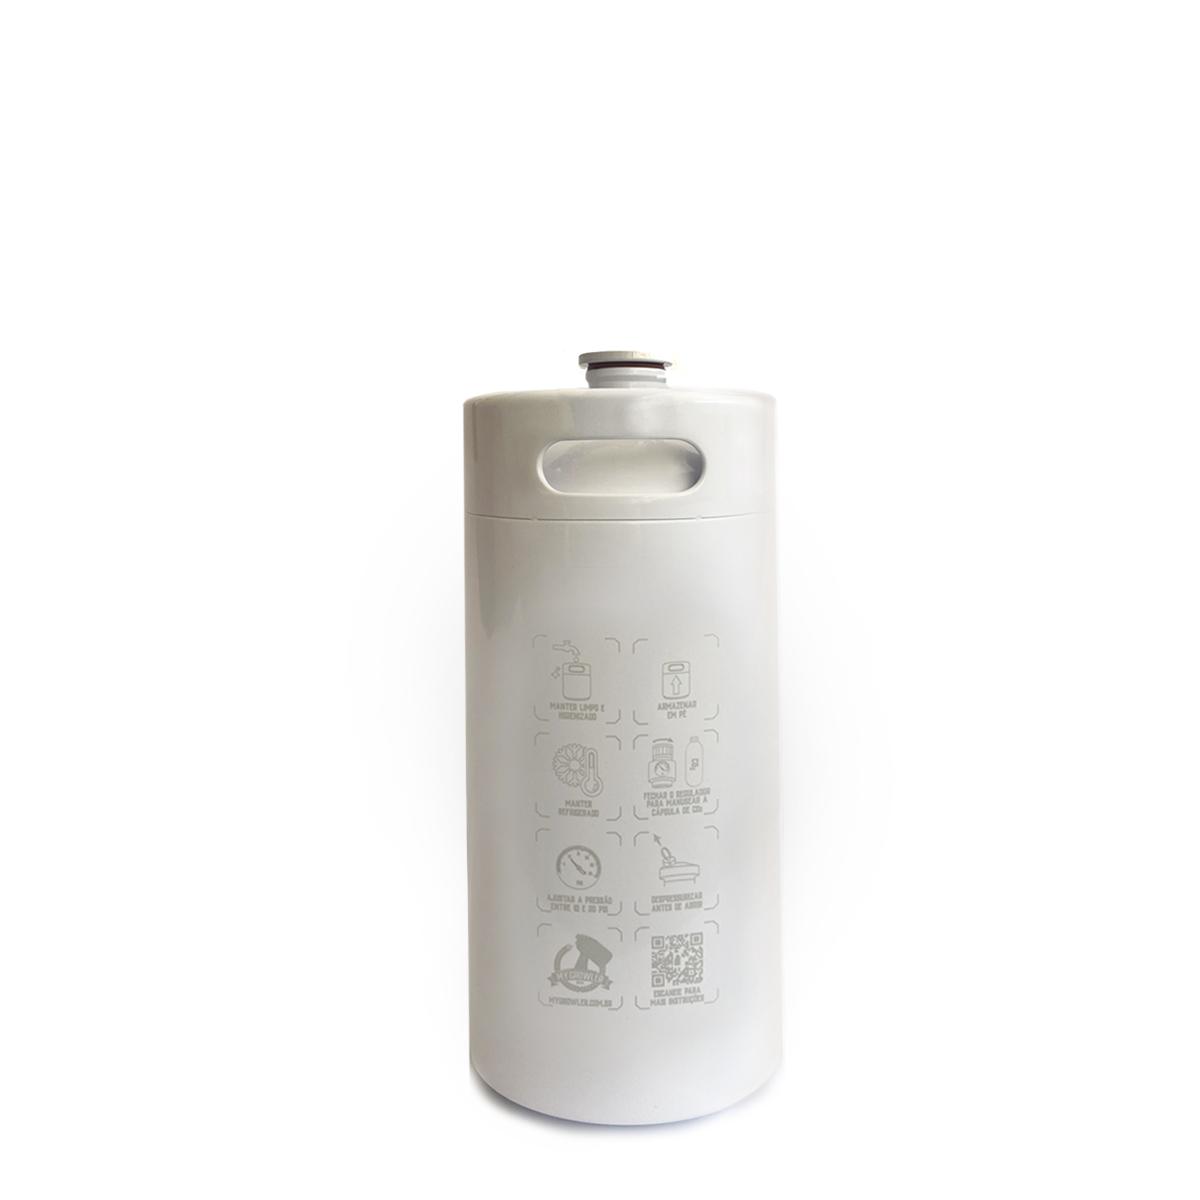 Kit My Keg: Chopeira 3.6L branco com torneira americana standard